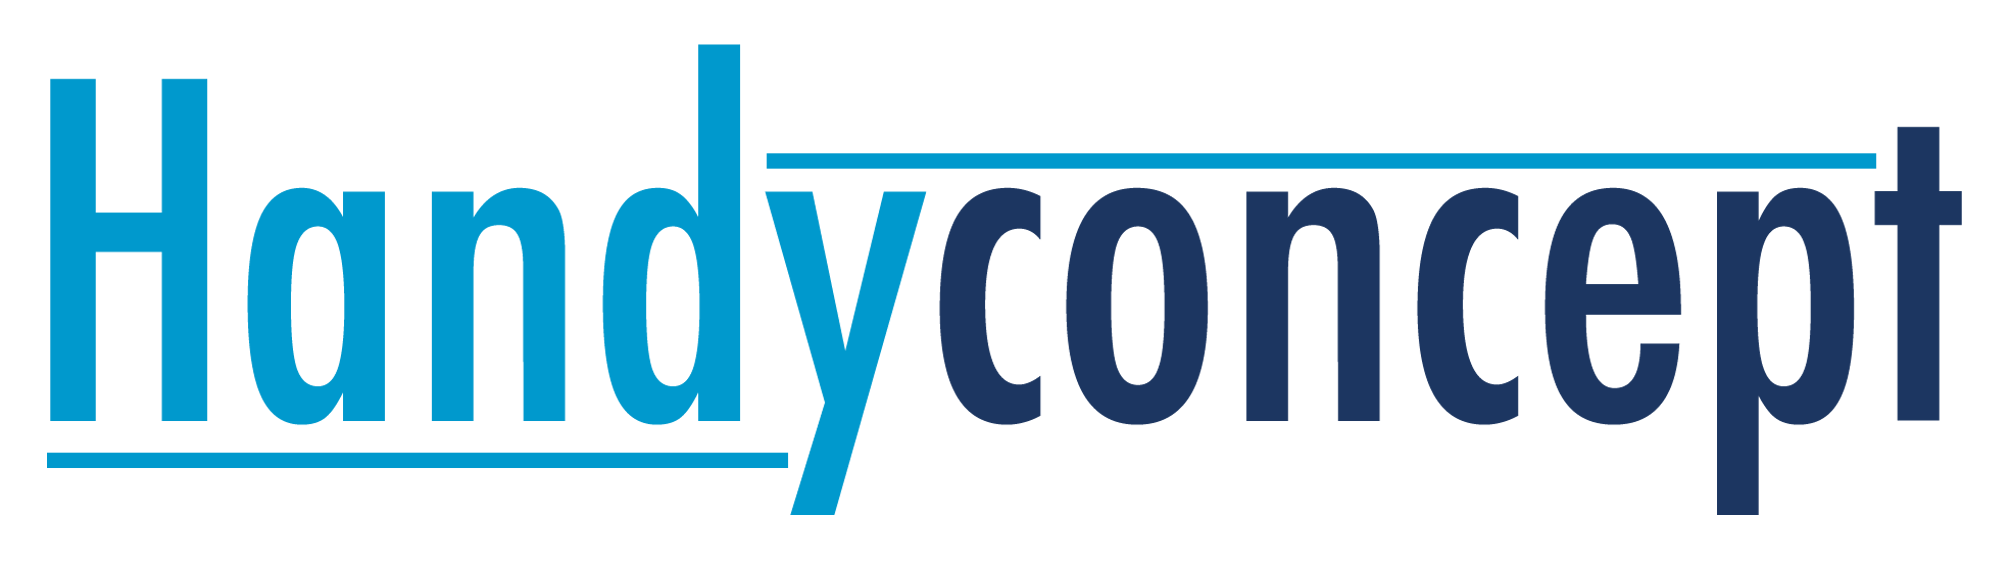 Control-Center Handyconcept24